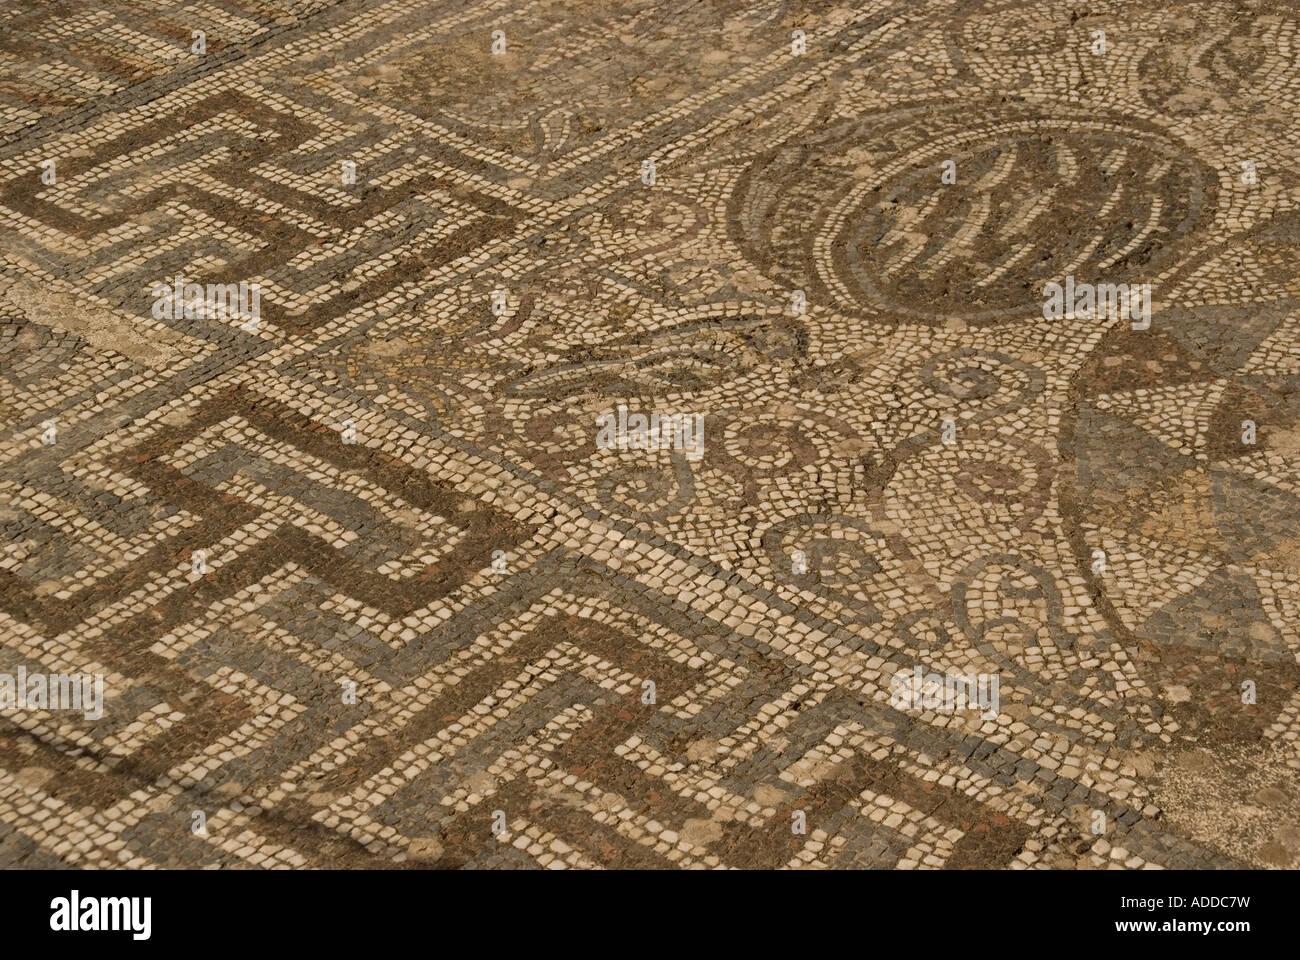 Roman mosaic tile floor at Ephesus, Turkey - Stock Image